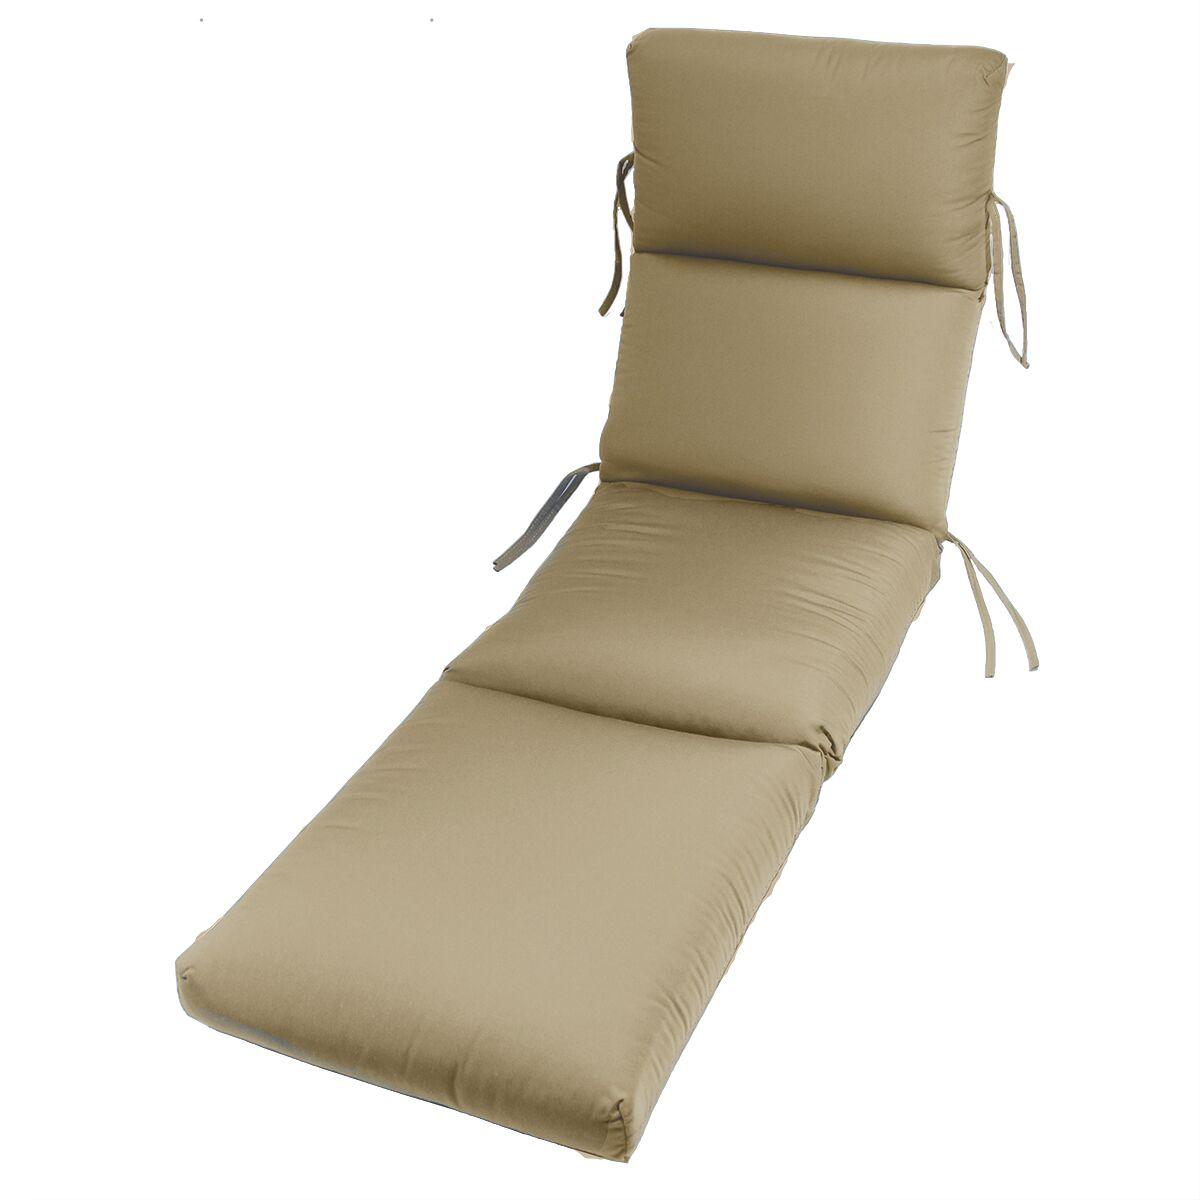 Kellner Indoor/Outdoor Sunbrella Chaise Lounge Cushion Fabric: Antique Beige